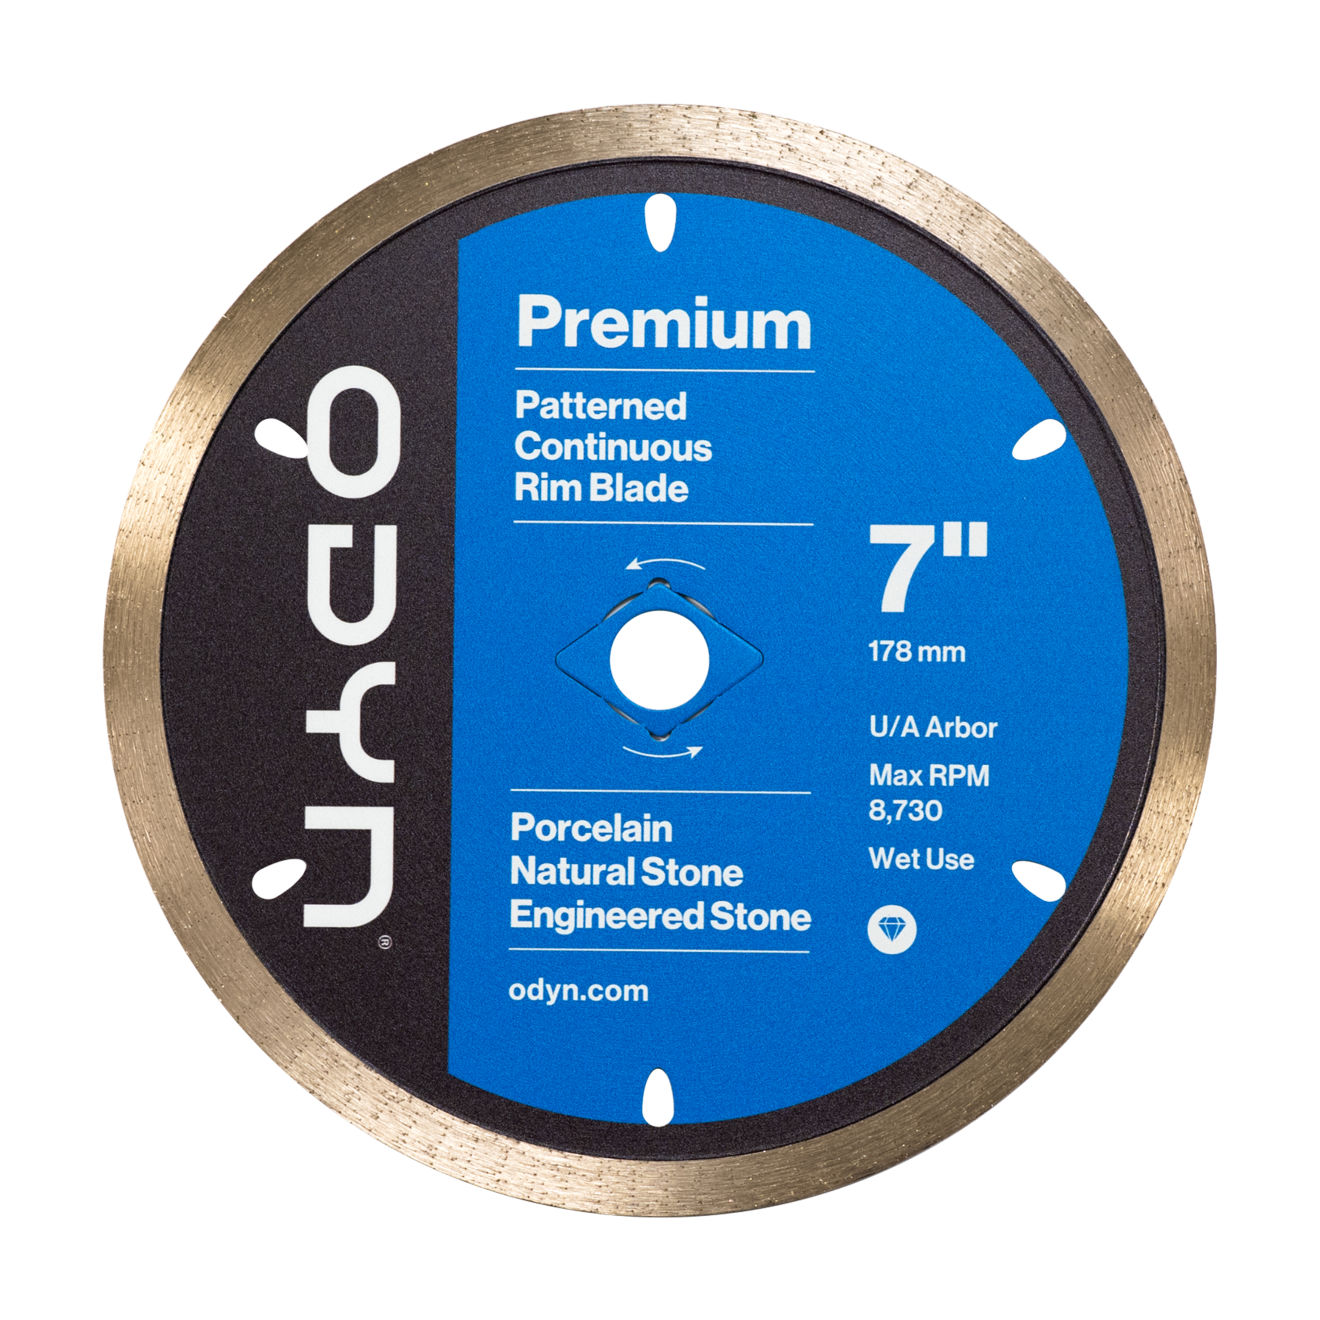 Odyn 7 in. Premium Pattern Continuous Rim Blade